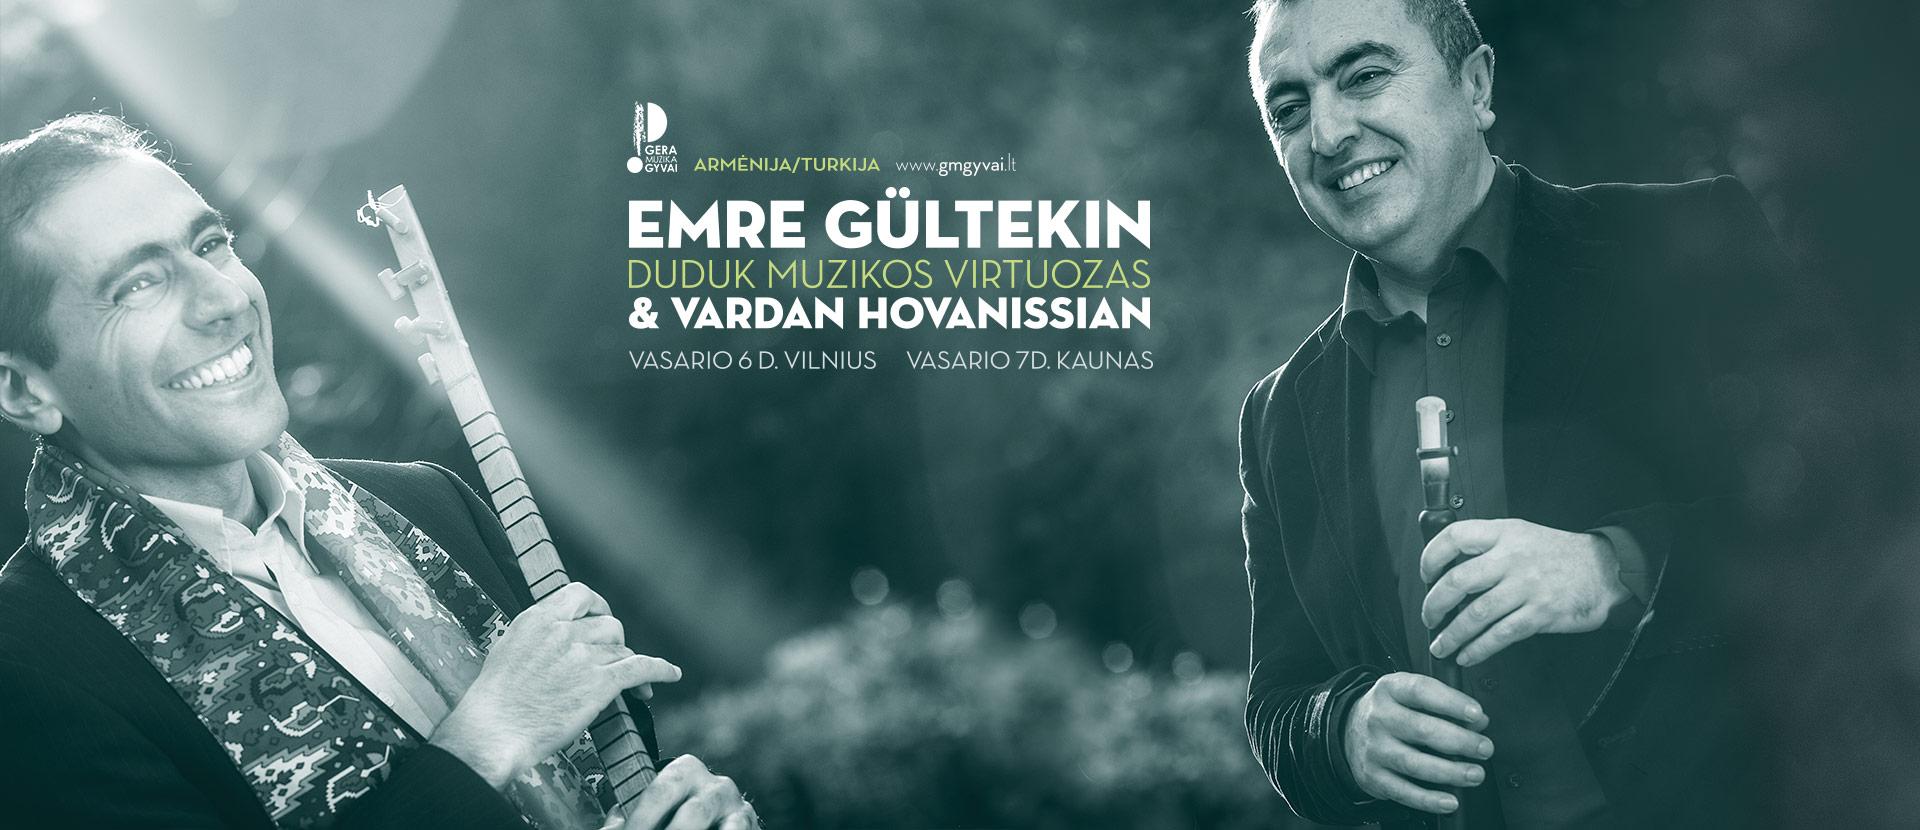 Vardan Hovanissian ir Emre Gultekin